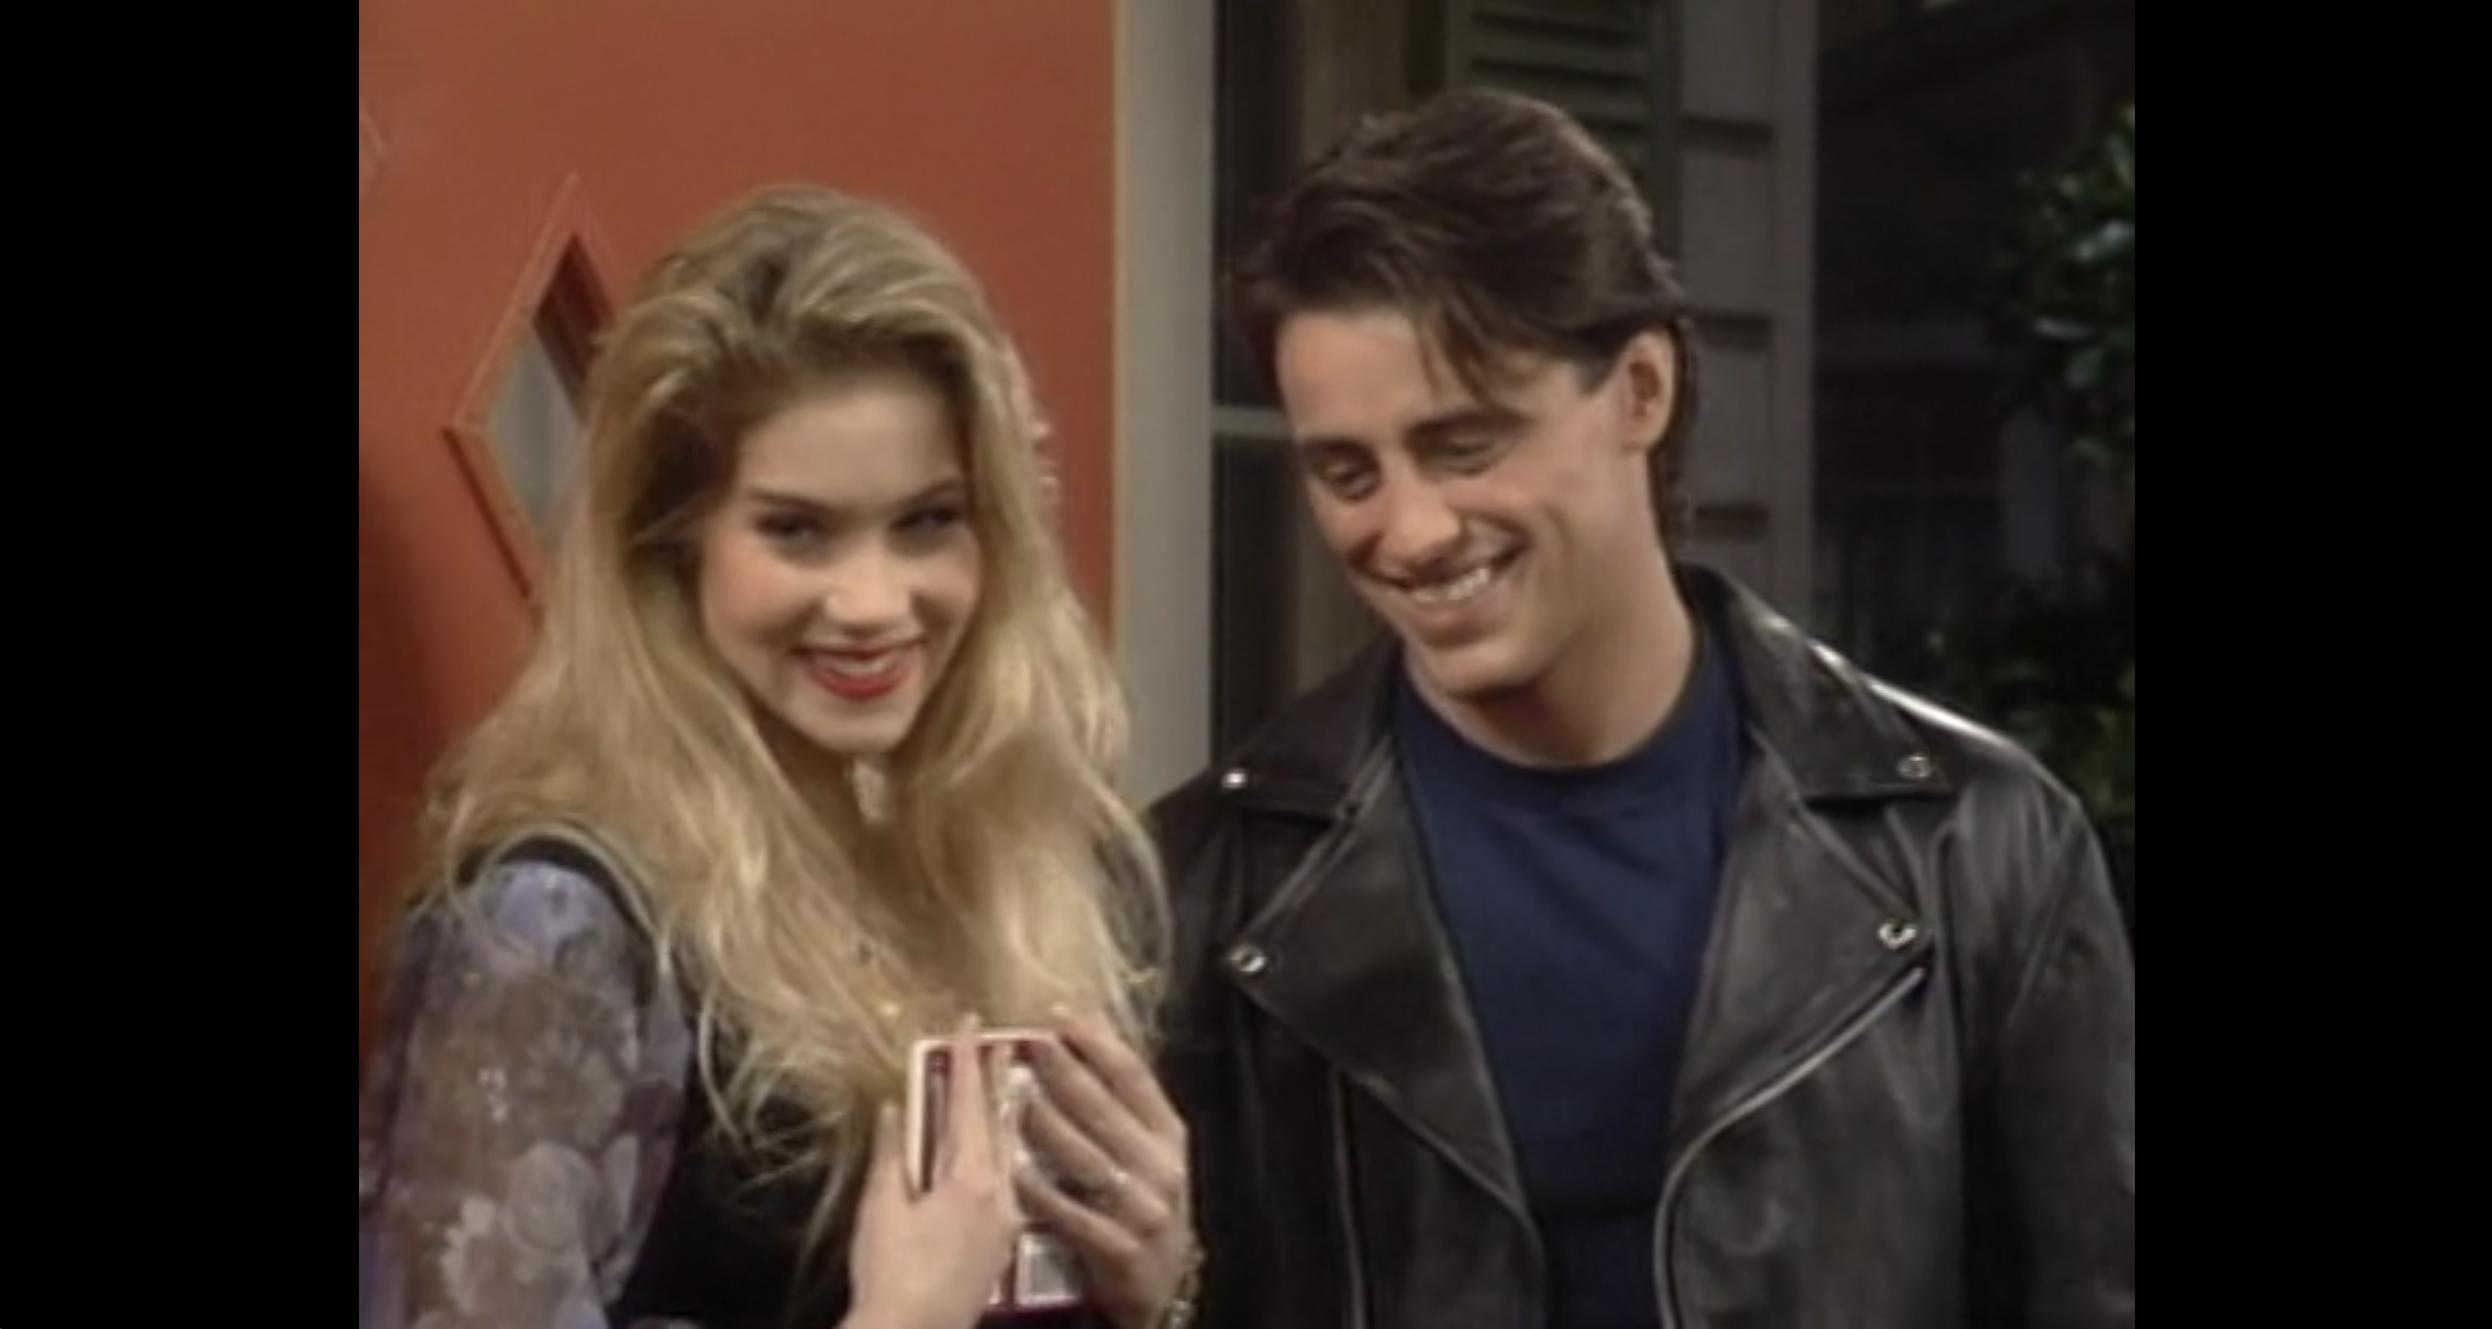 Christina Applegate and Matt LeBlanc in Married with Children (1987)